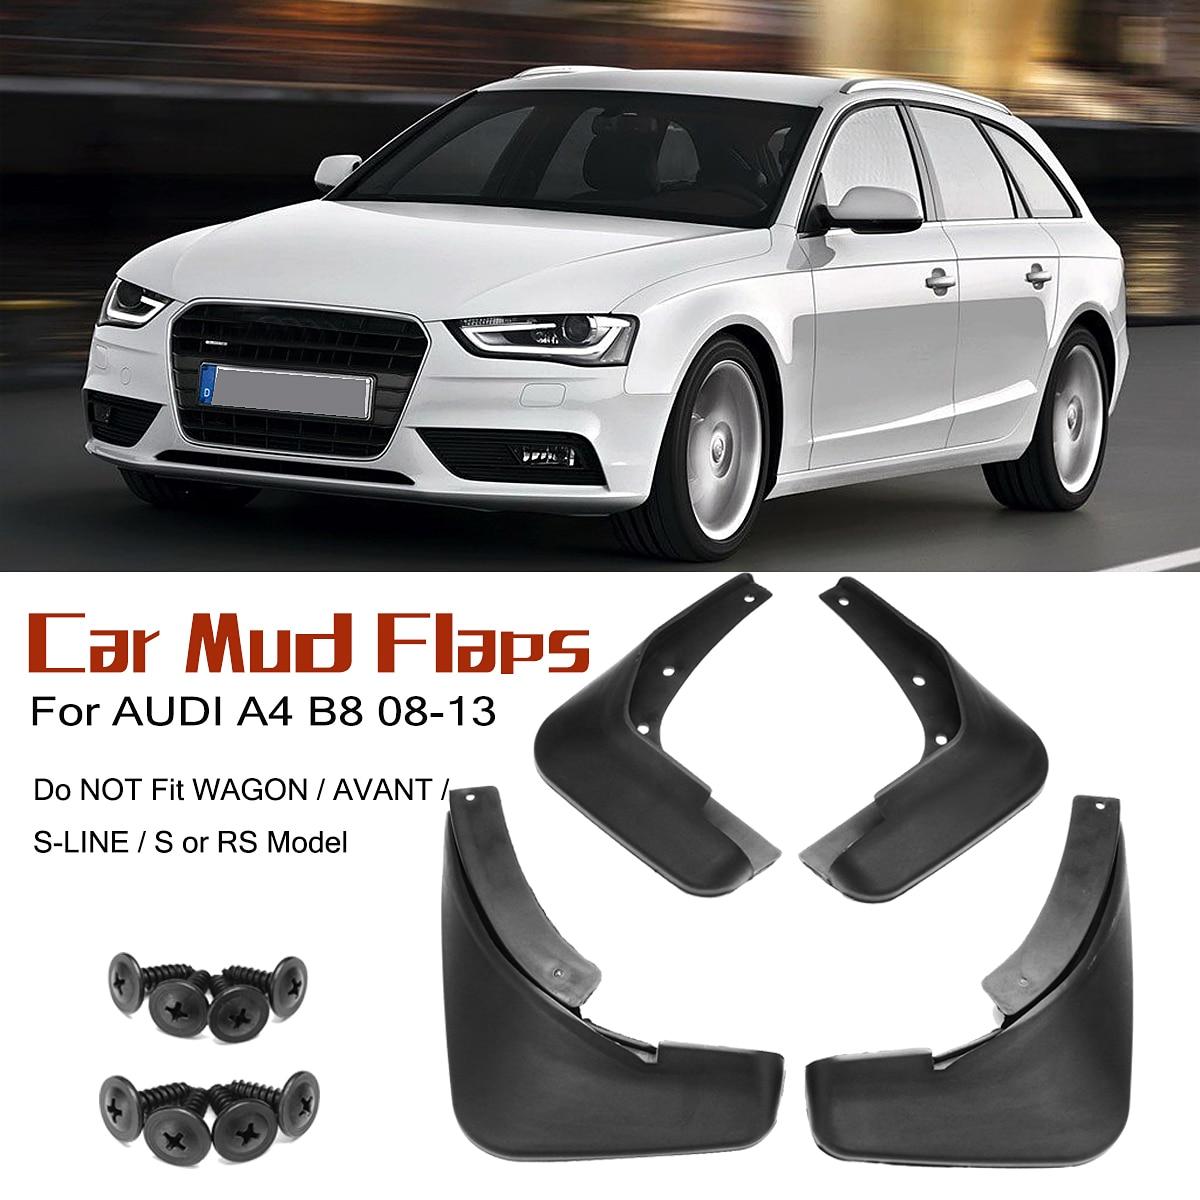 4pcs Car Fender for Audi A4 B8 2008 2009 2010 2011 2012 2013 Mud Flaps Splash Guards Auto Mudflap Mudguard Accessories